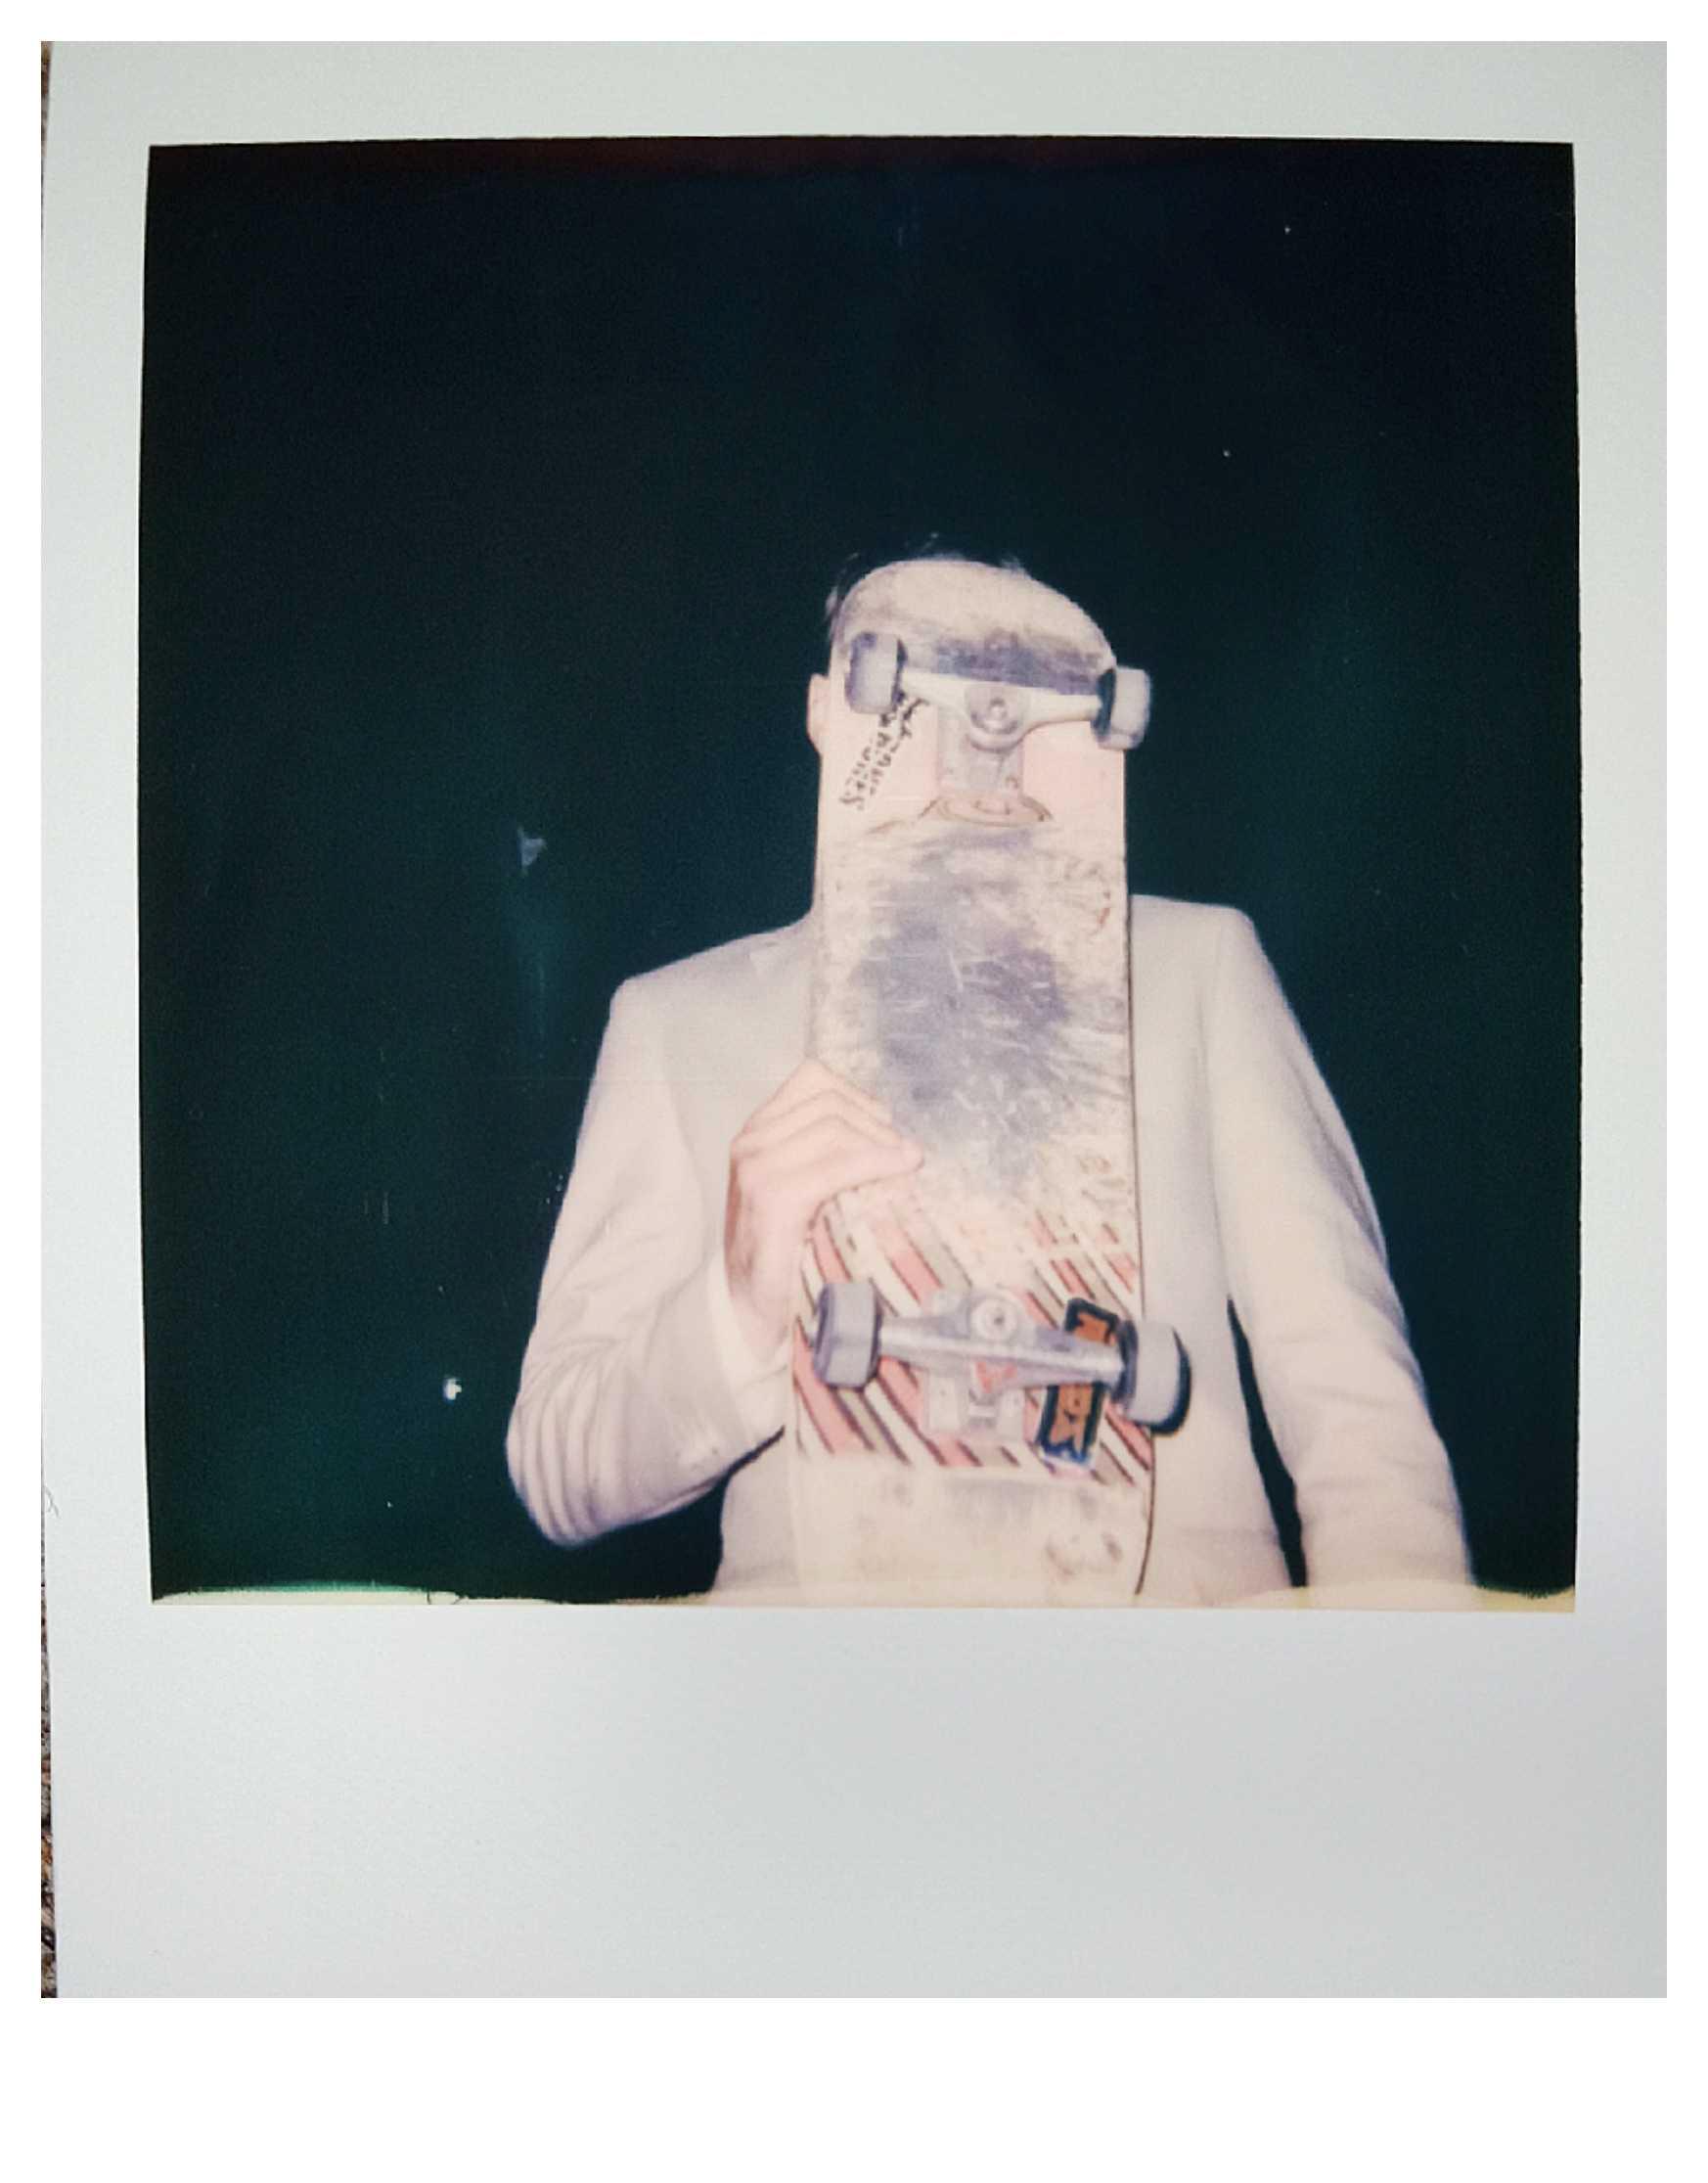 S&A Elopement - Kings & Thieves - Shred 'Til Dead - Central Coast Beach Forest Wedding - 428.jpg